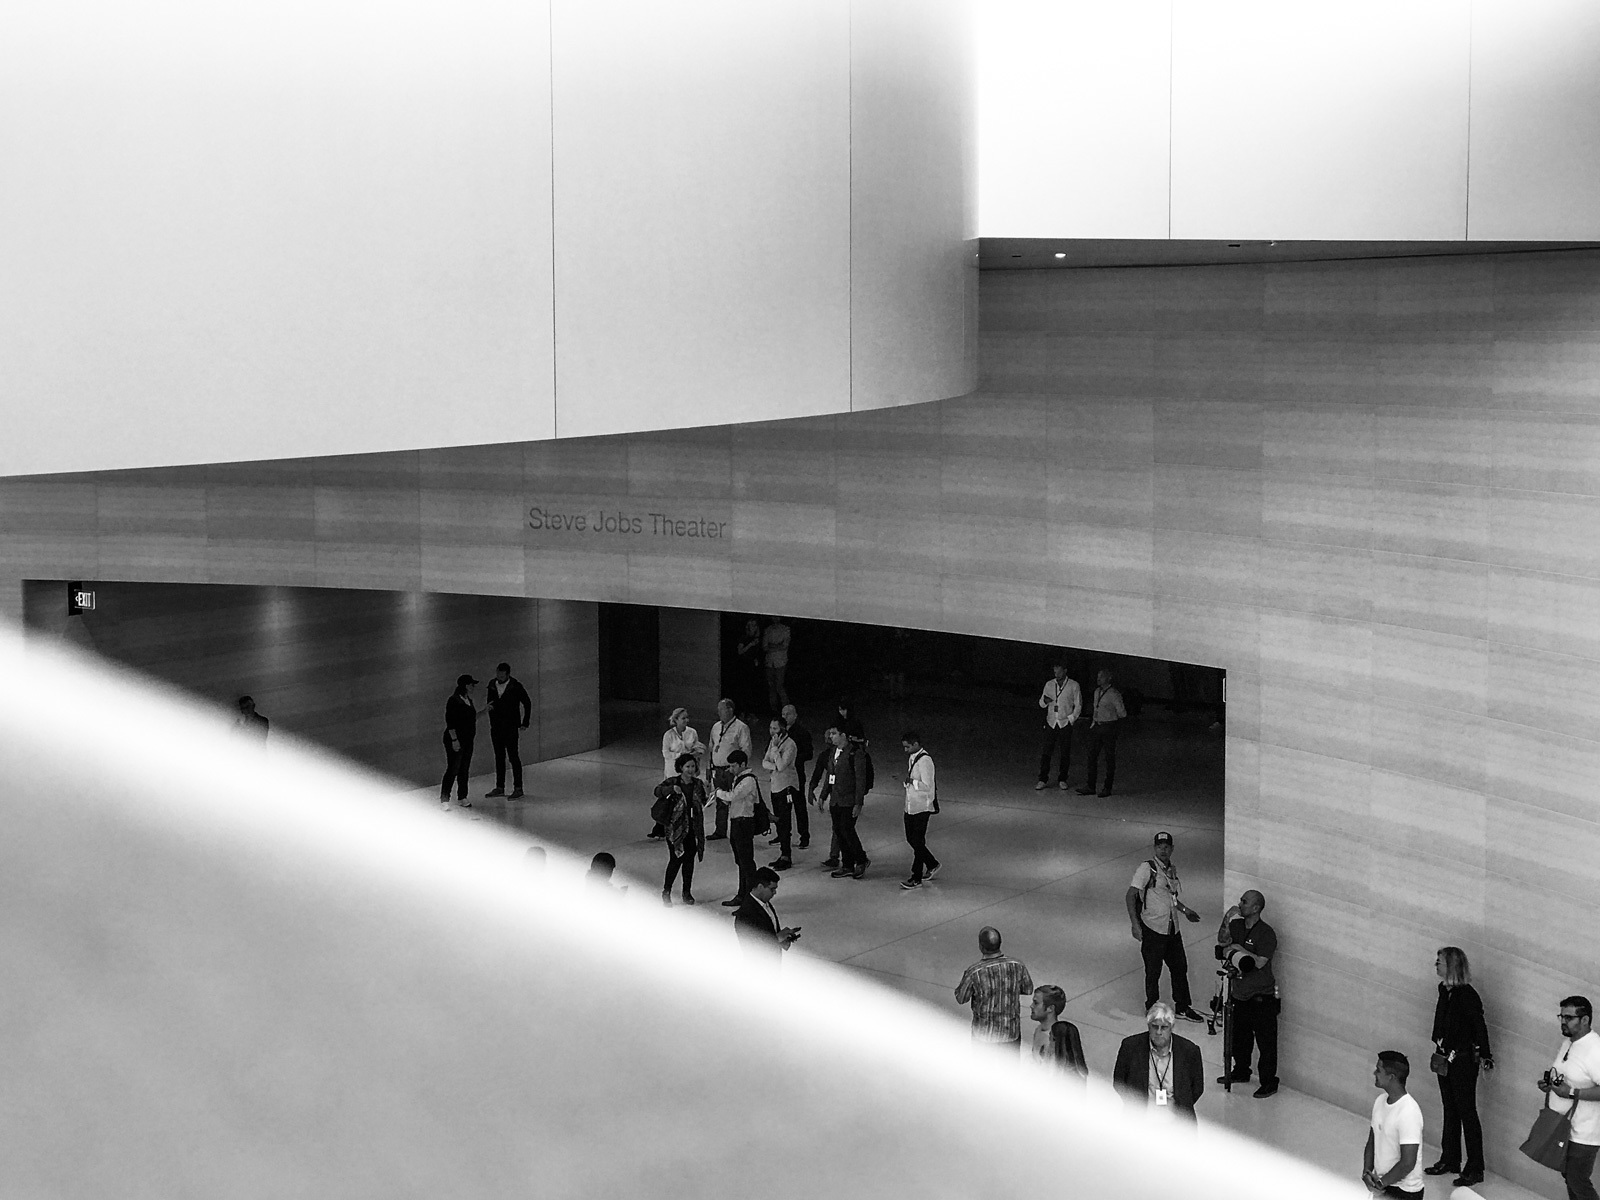 large_apple-steve-jobs-theater-12.jpg